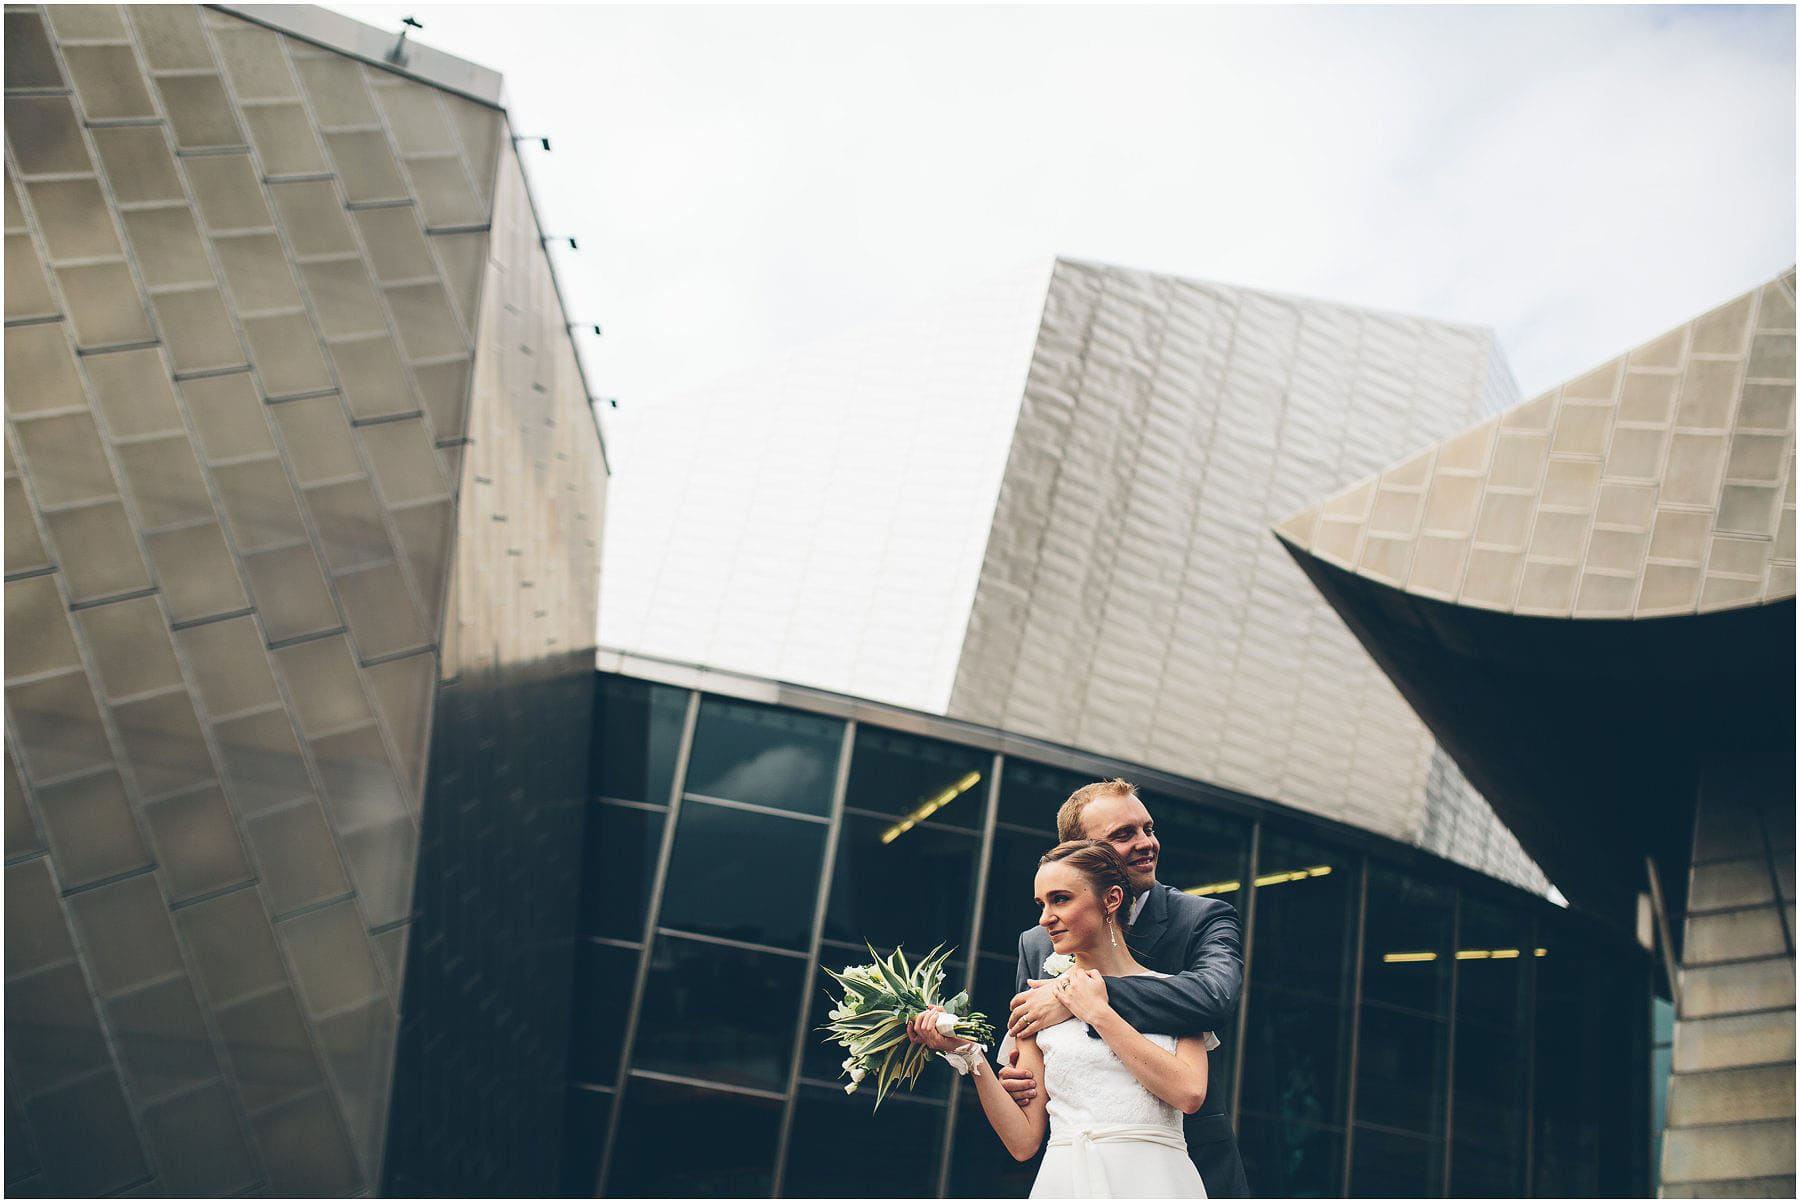 Lowry_Theatre_Wedding_Photography_0074